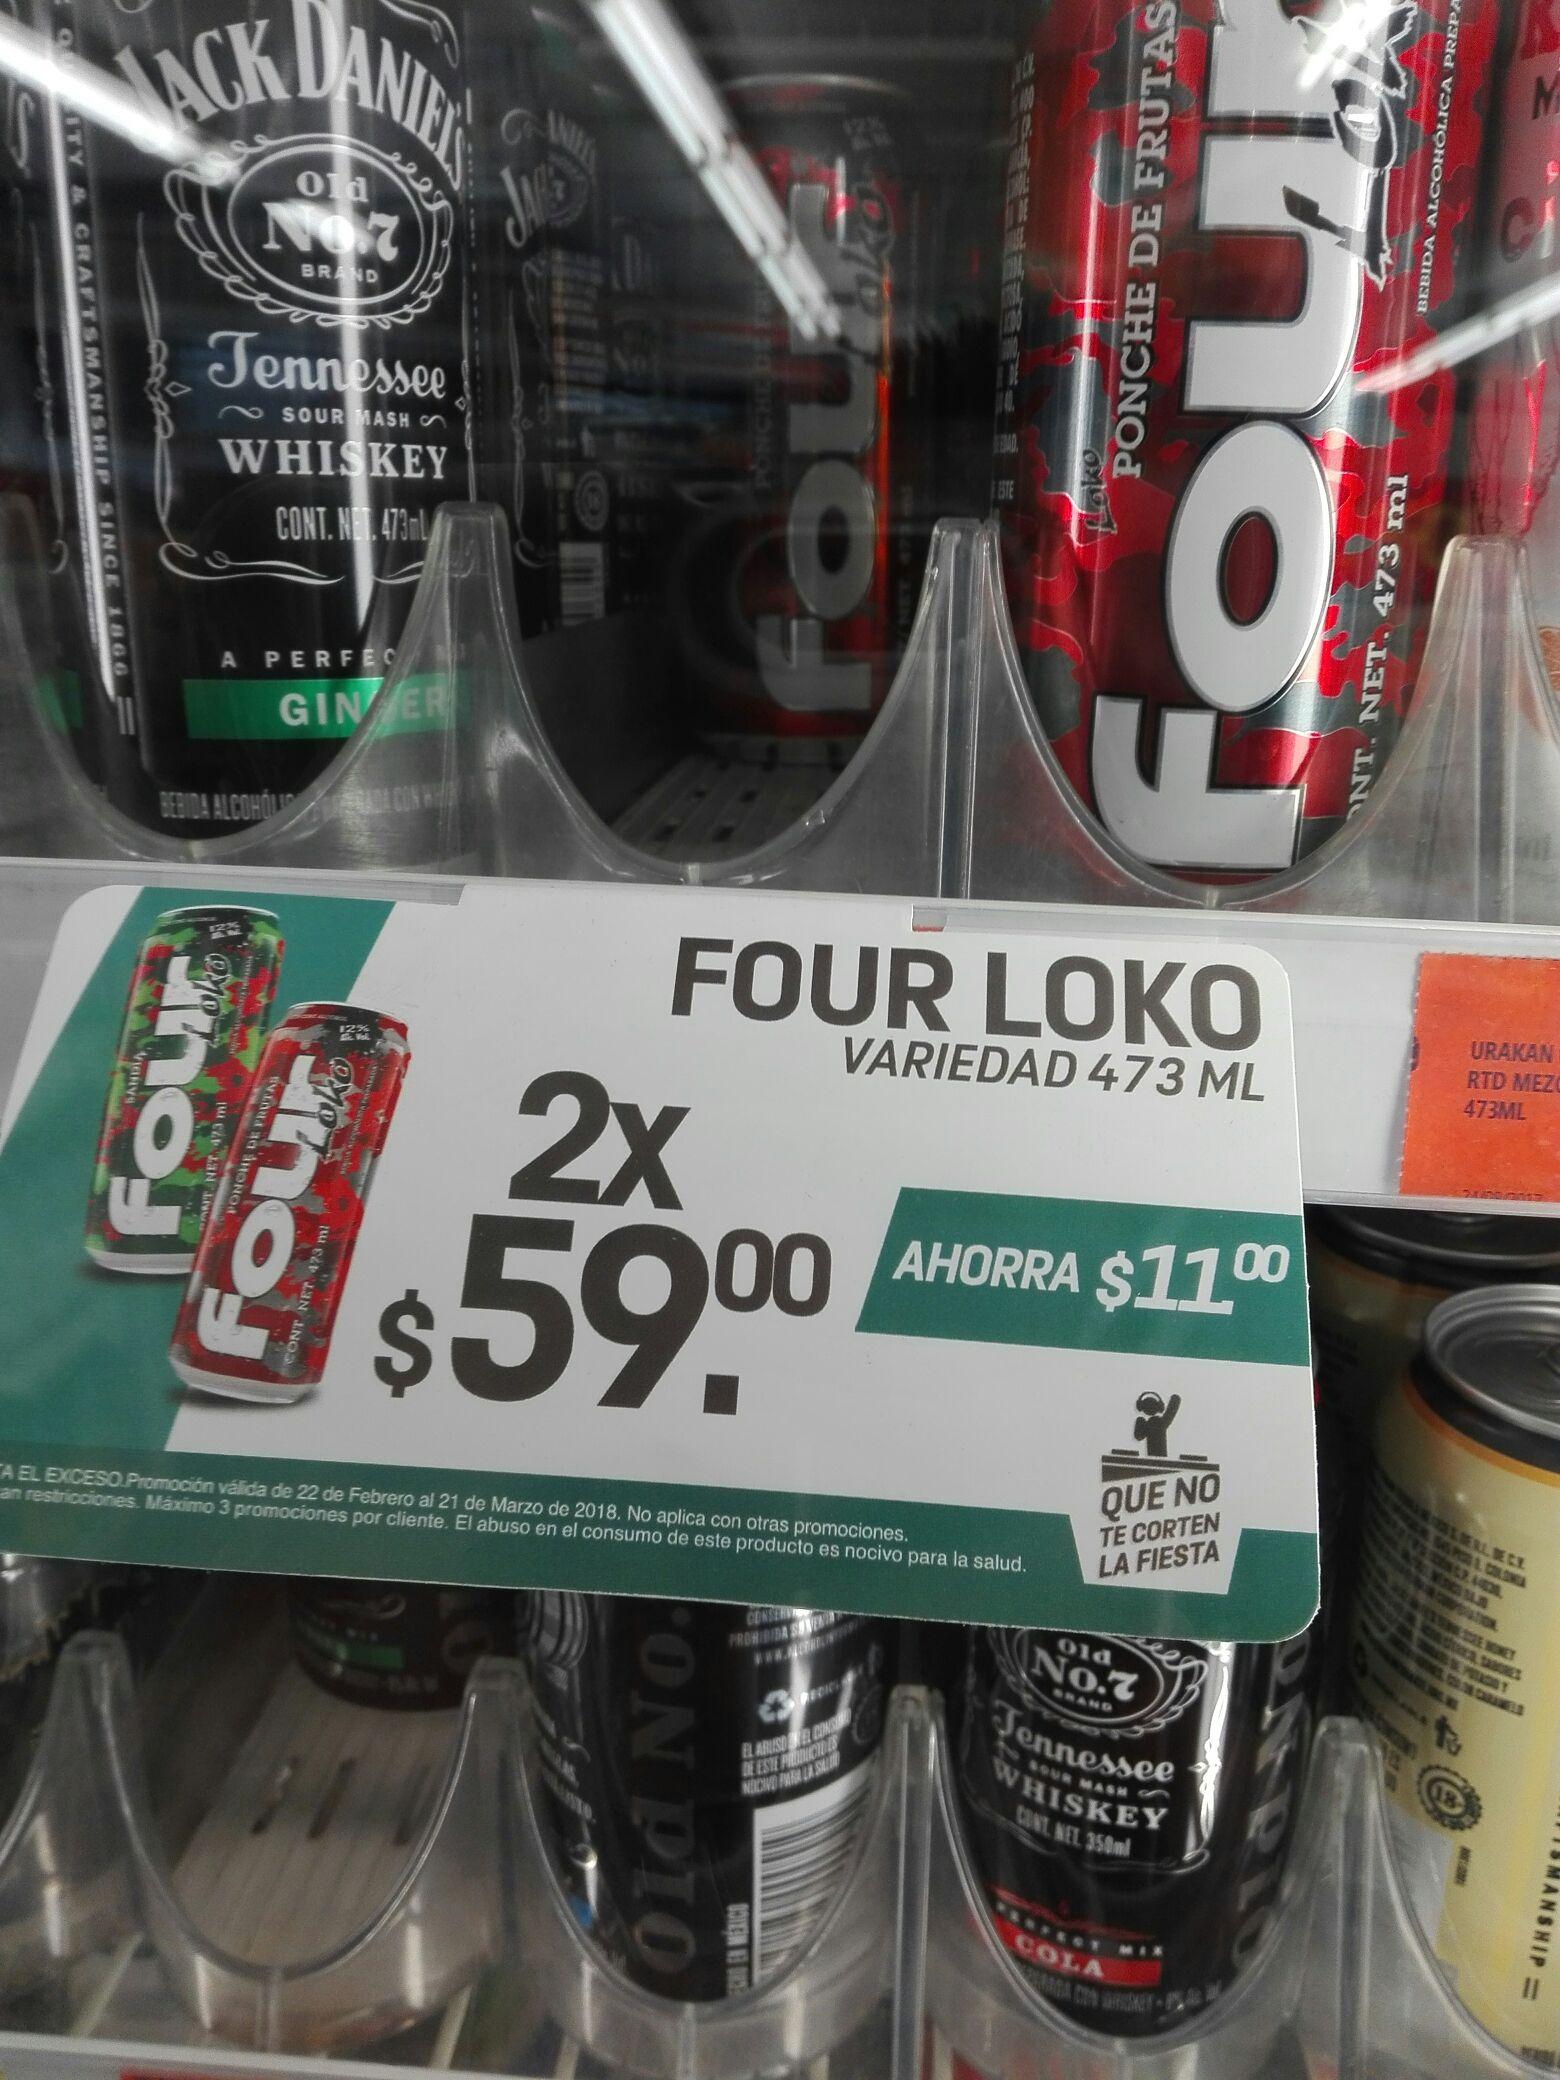 7 Eleven: Four Loko 2x$59